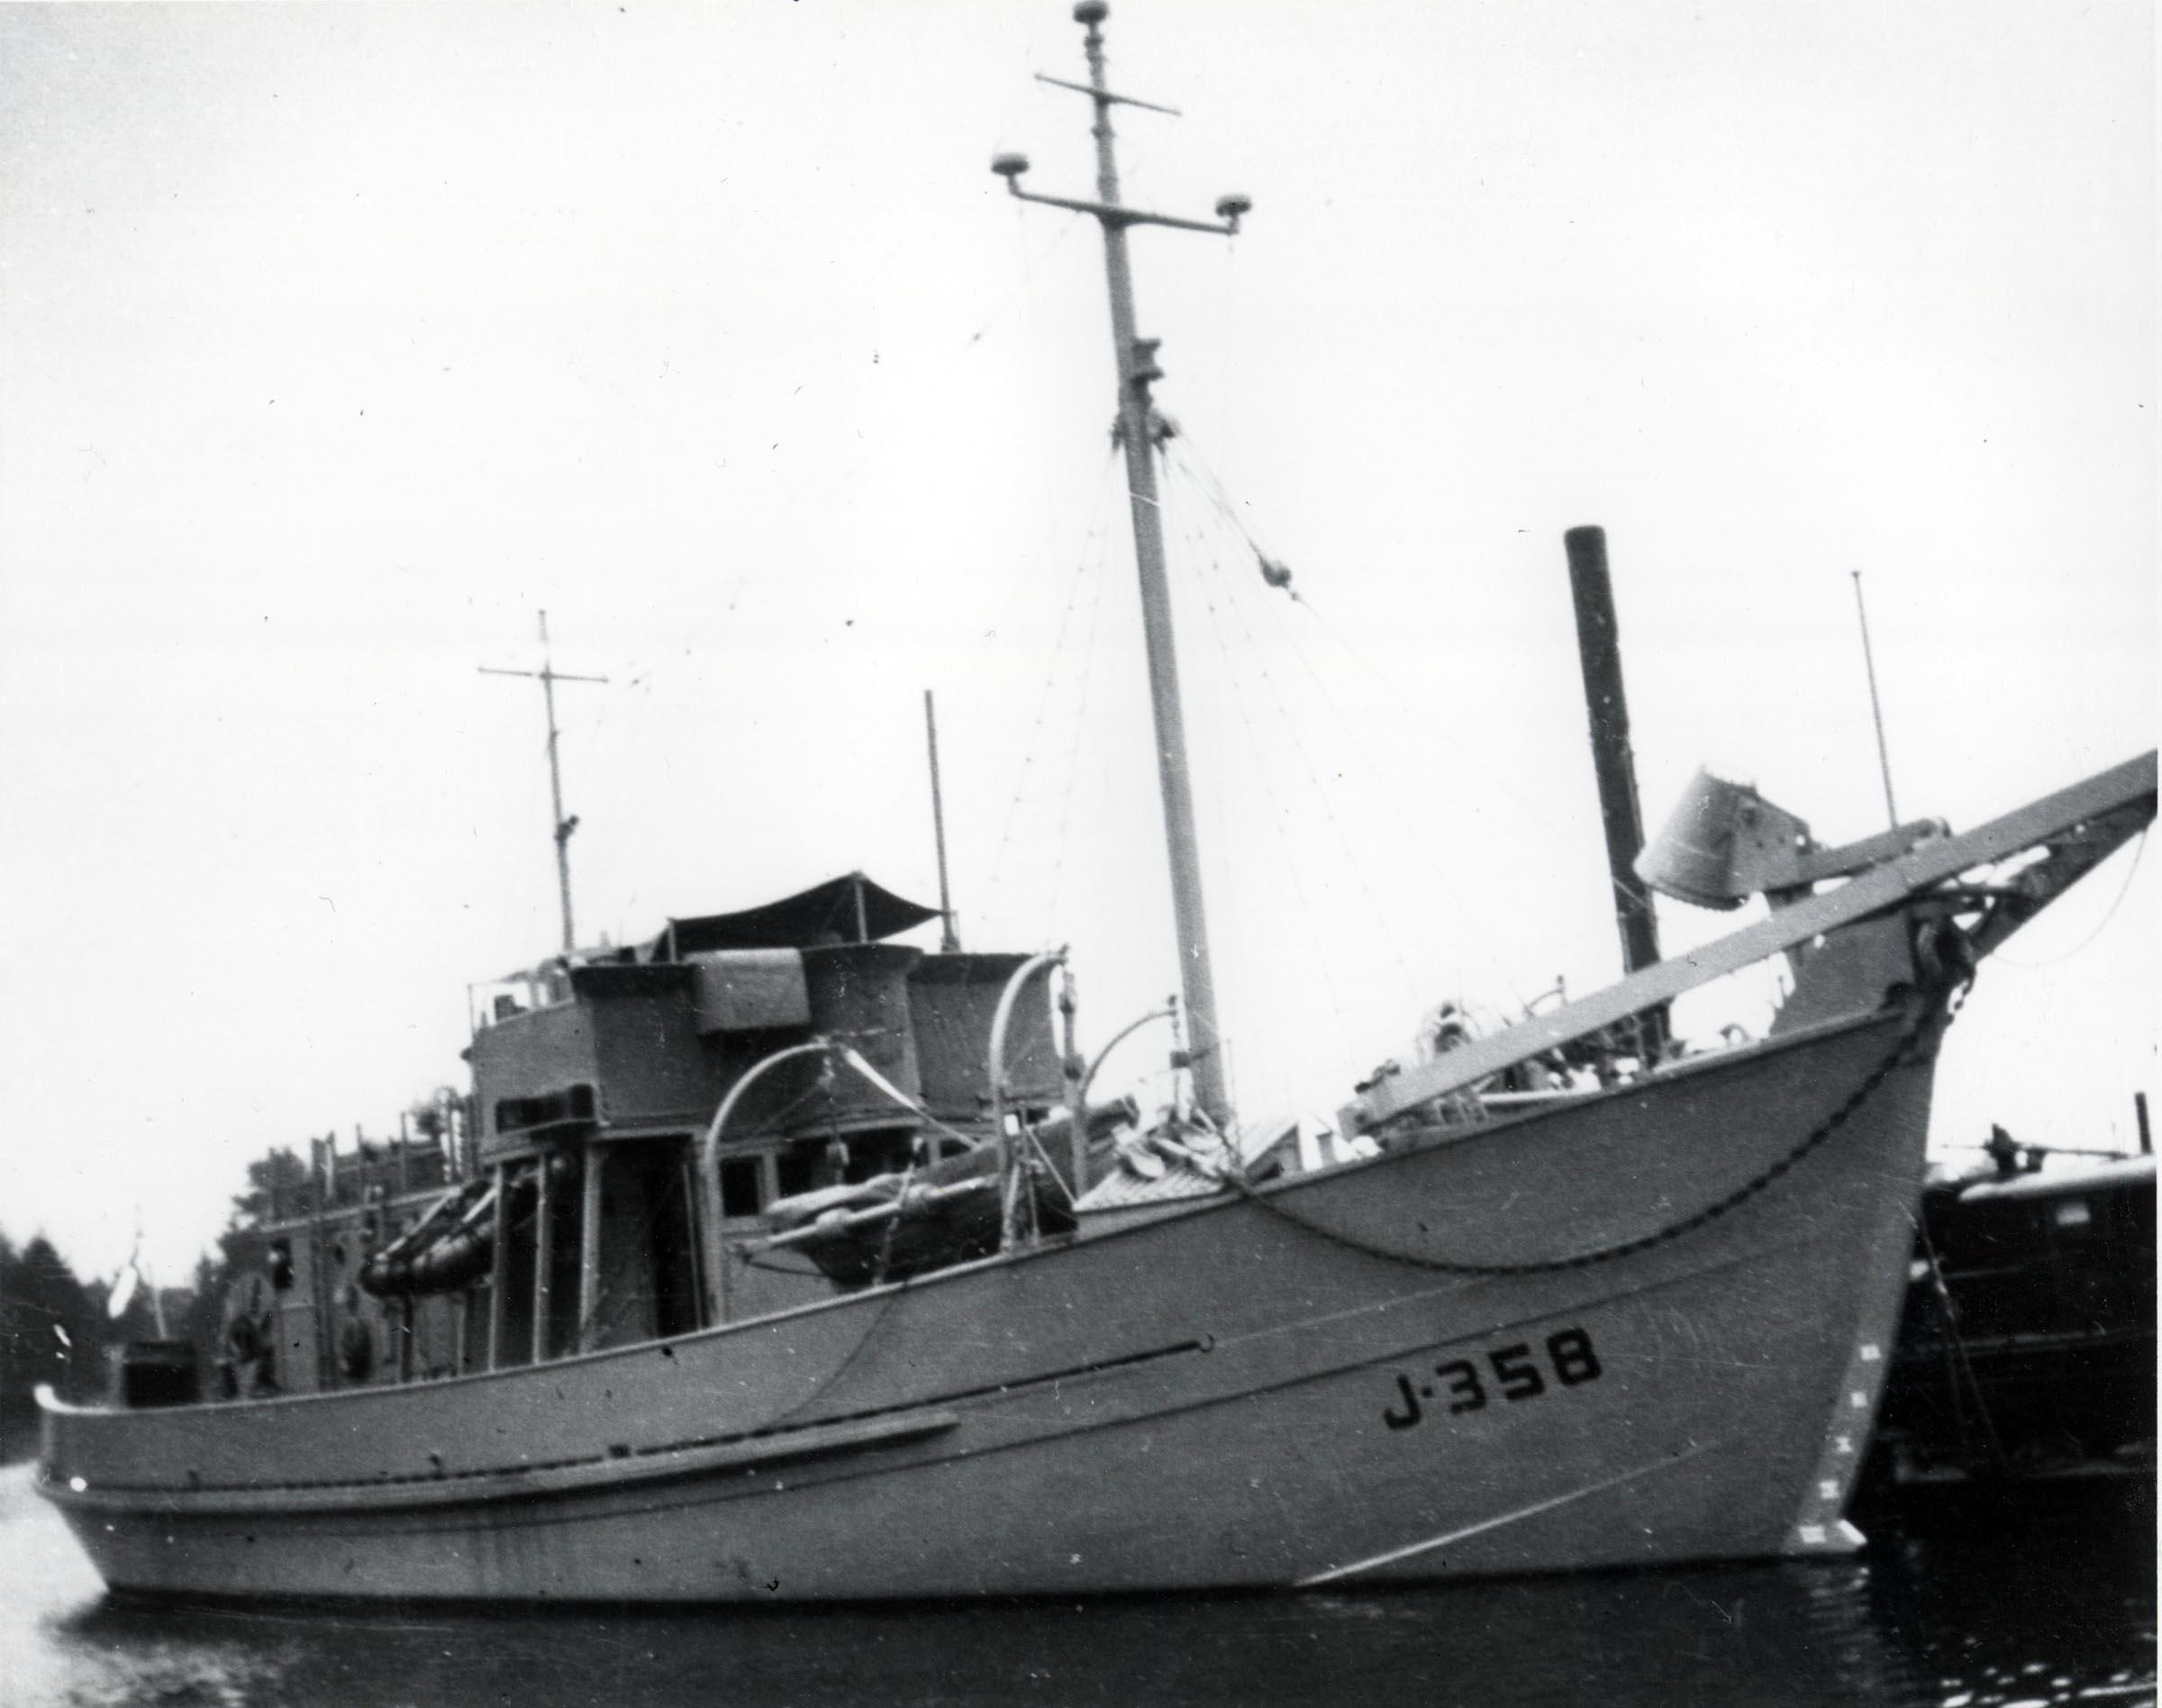 HMCS ROSSLAND